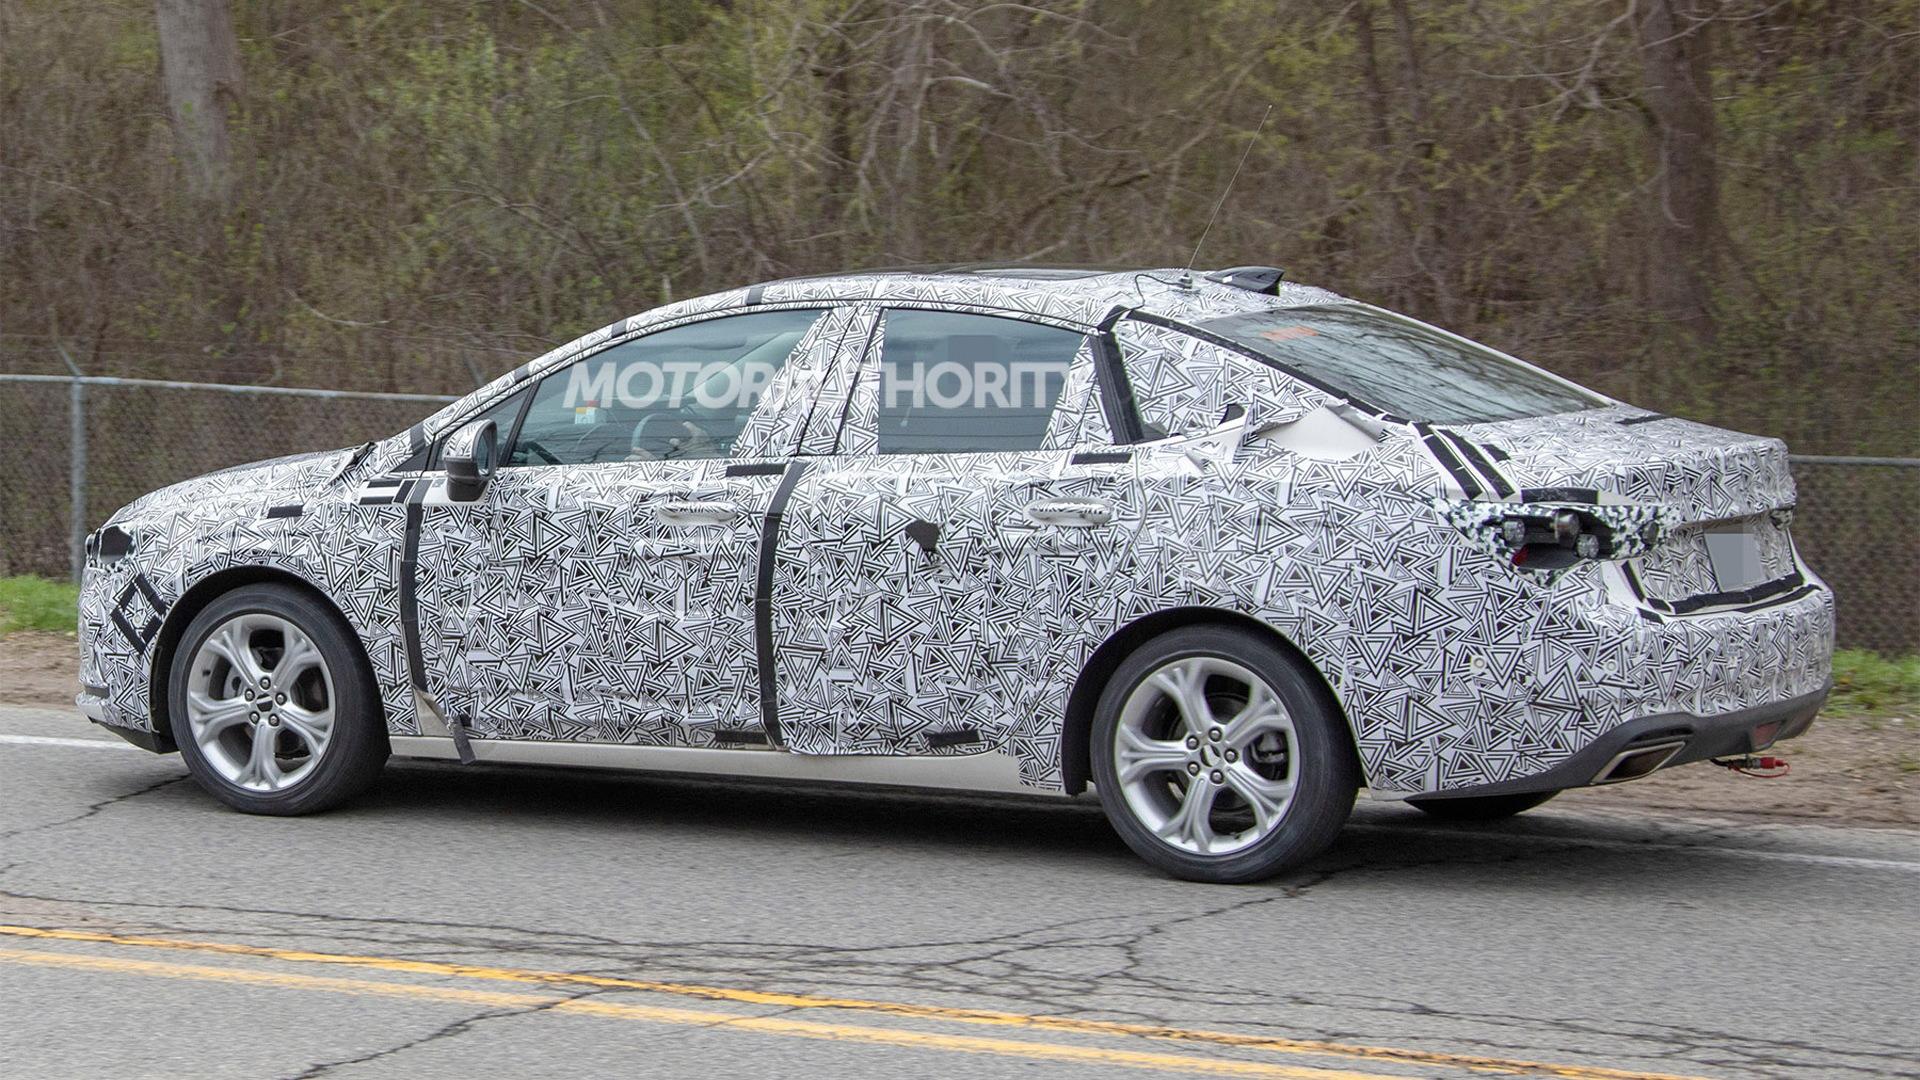 2020 Buick Verano facelift spy shots - Image via S. Baldauf/SB-Medien